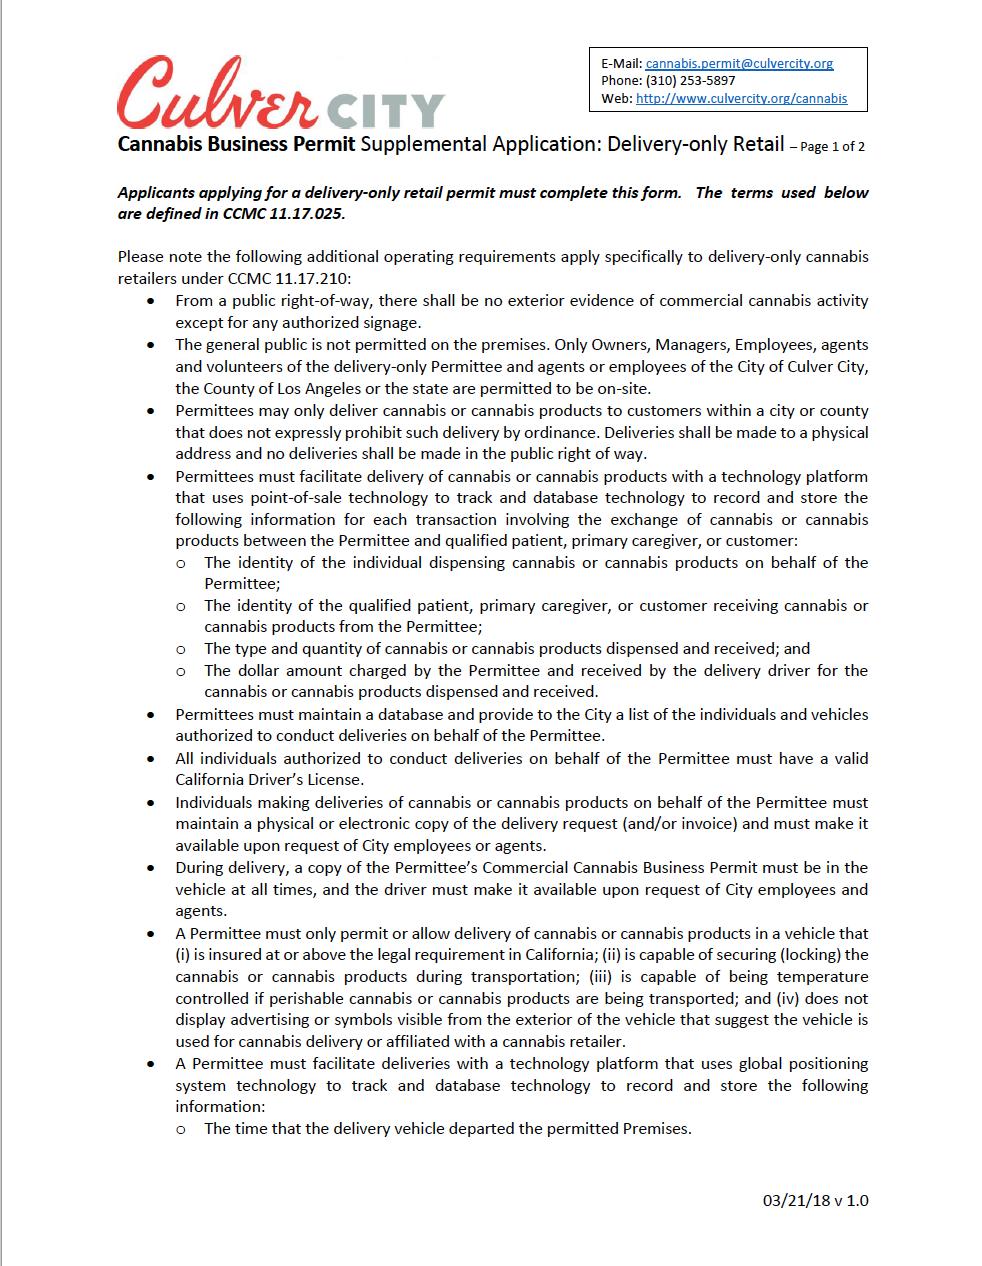 Supplemental Application 3.png